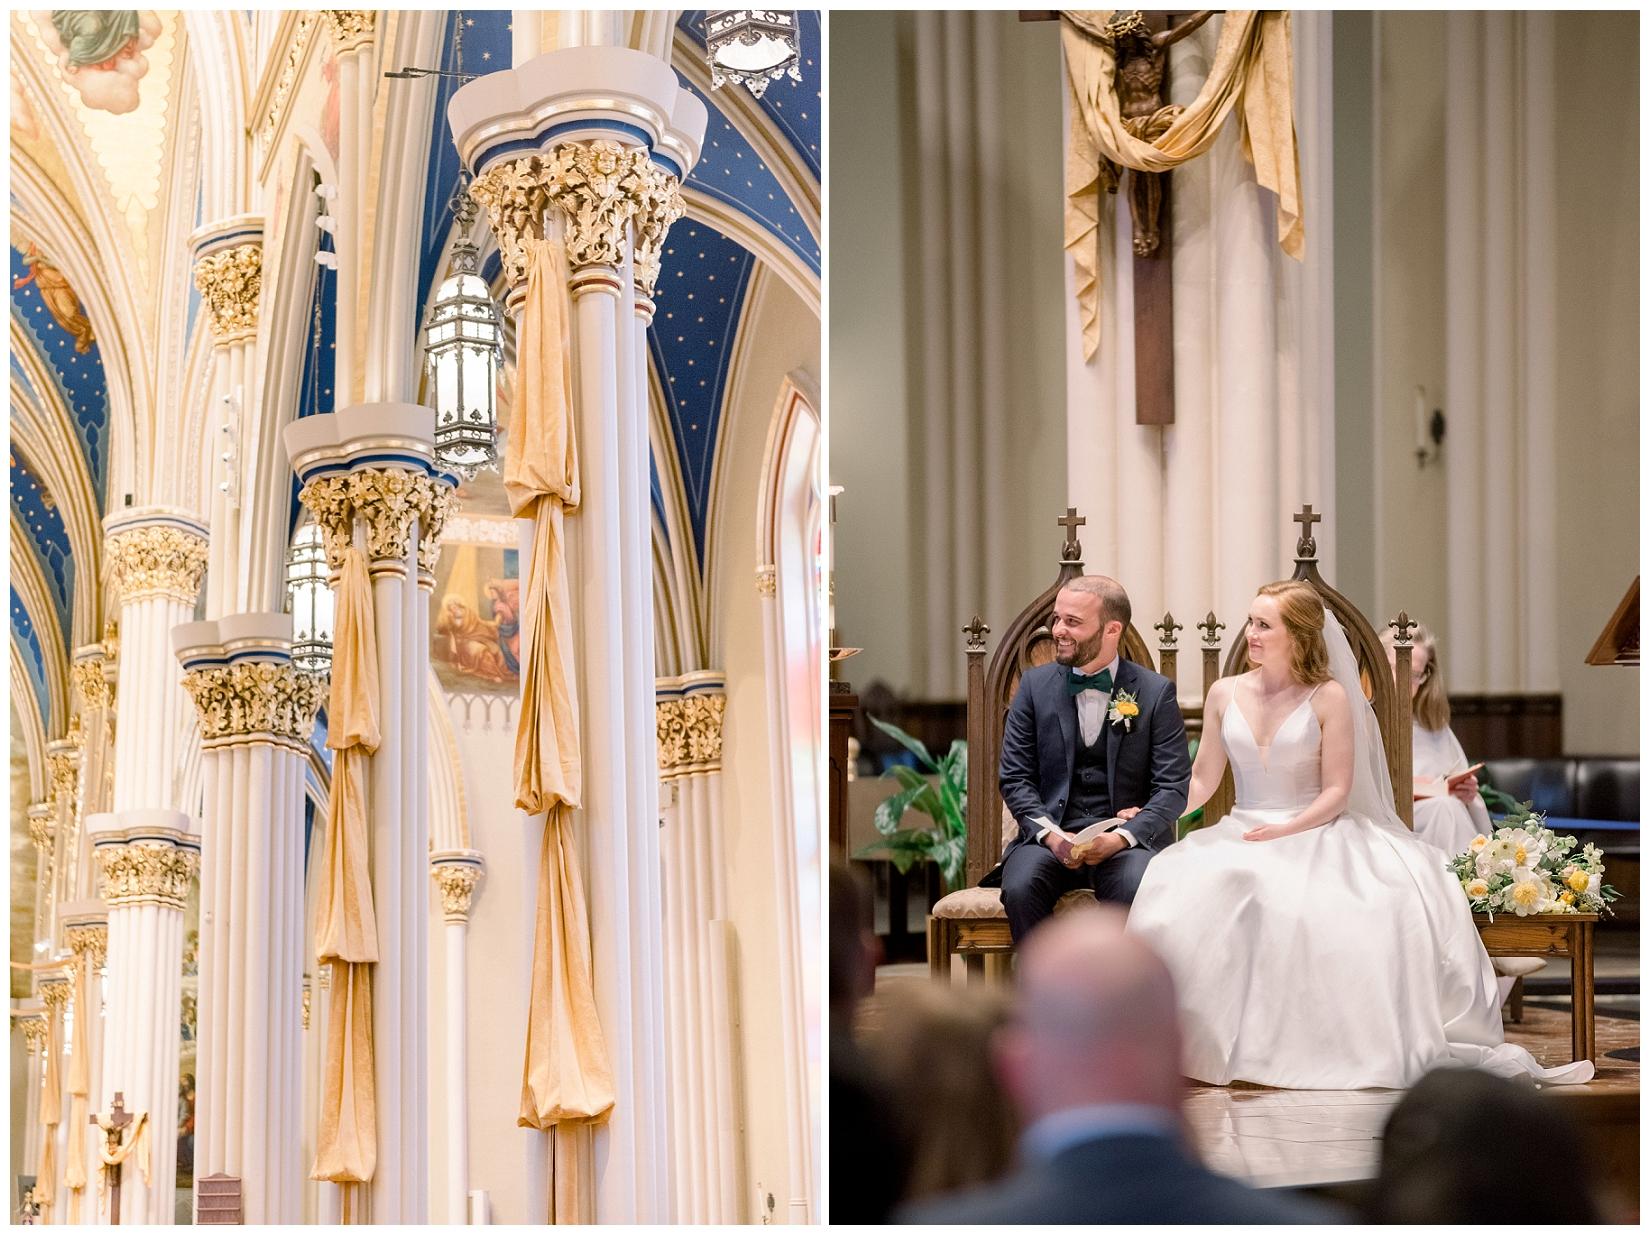 cat-alkire-wedding-photographer-indiana-chicago-indianapolis-fort-wayne_1196.jpg